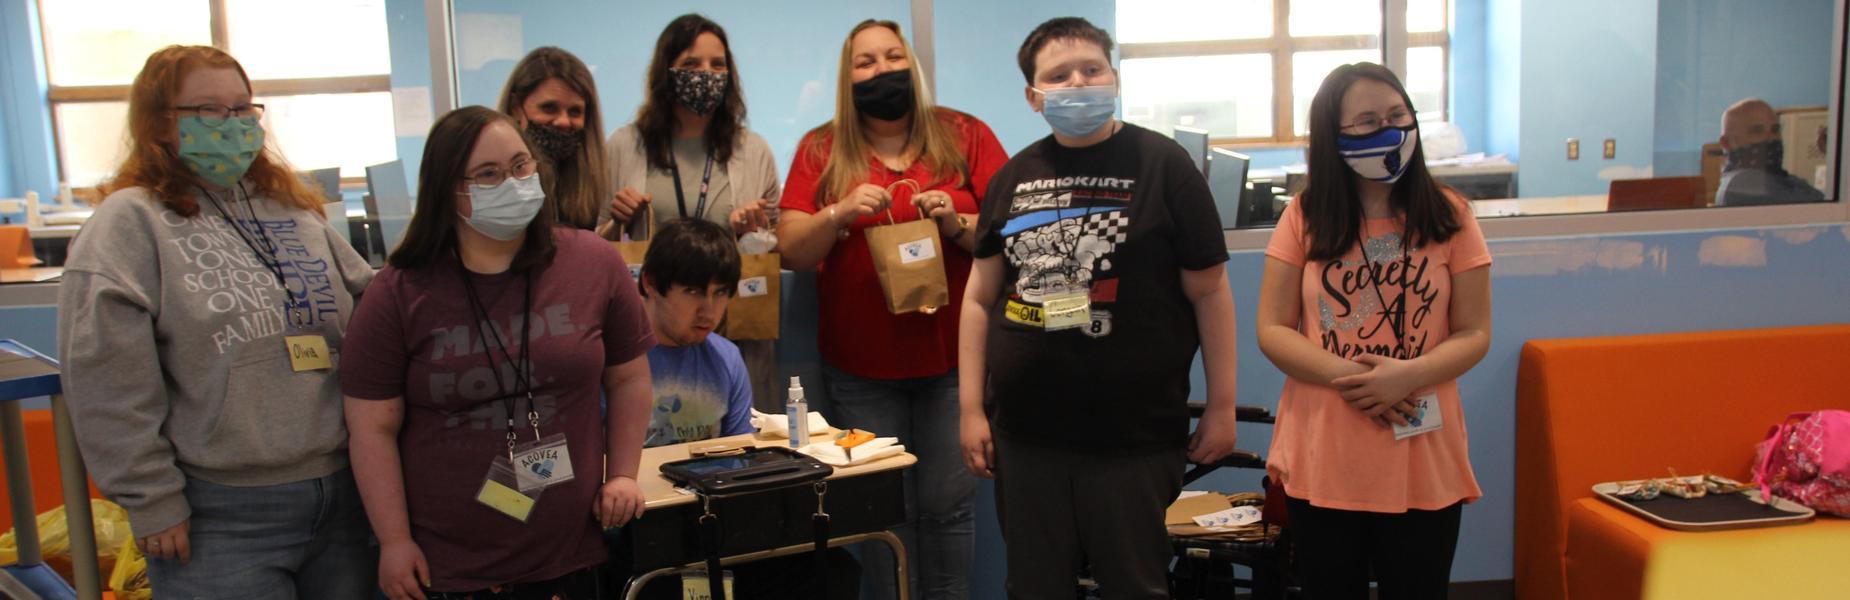 ACOVEA Students